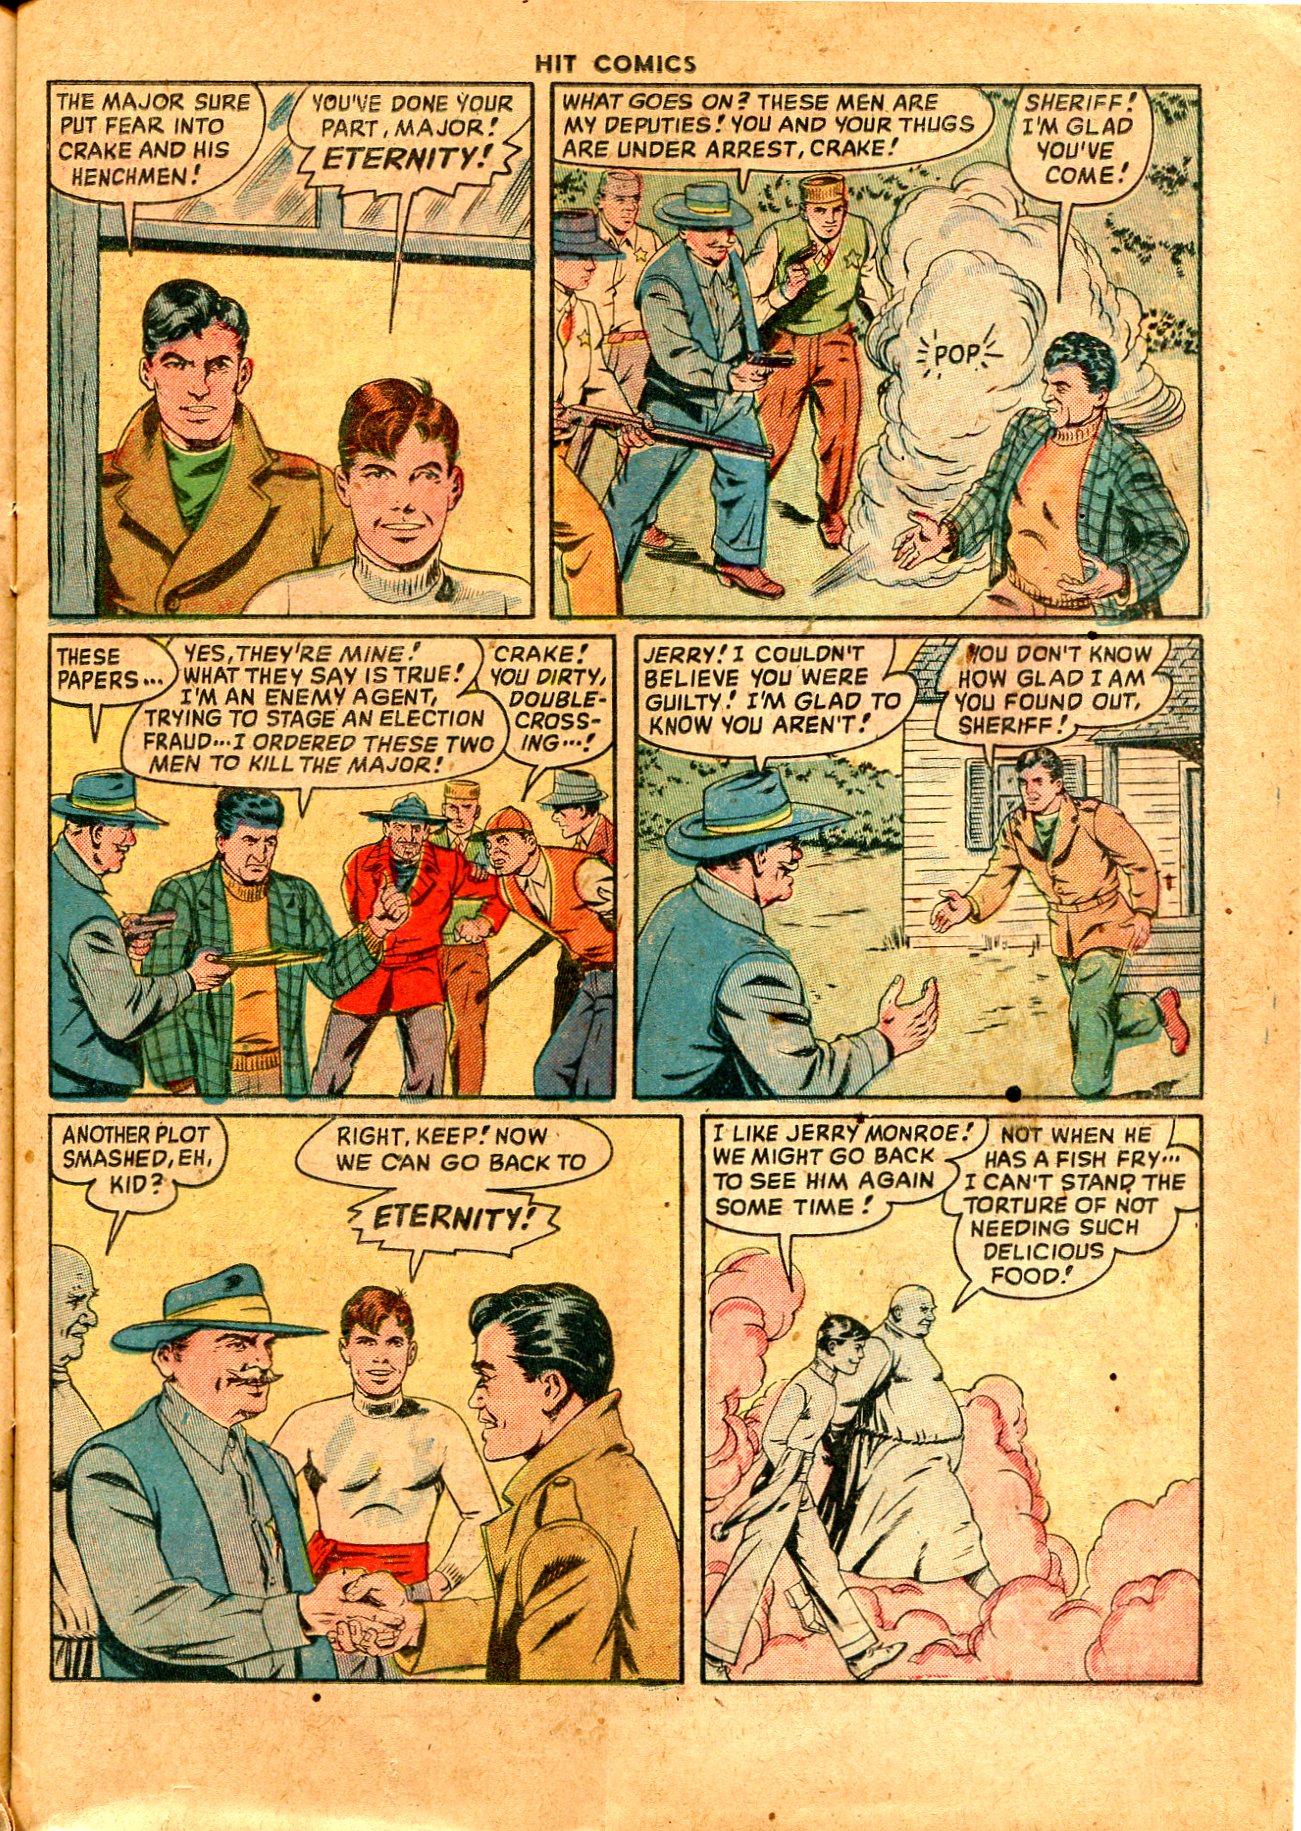 Read online Hit Comics comic -  Issue #57 - 15